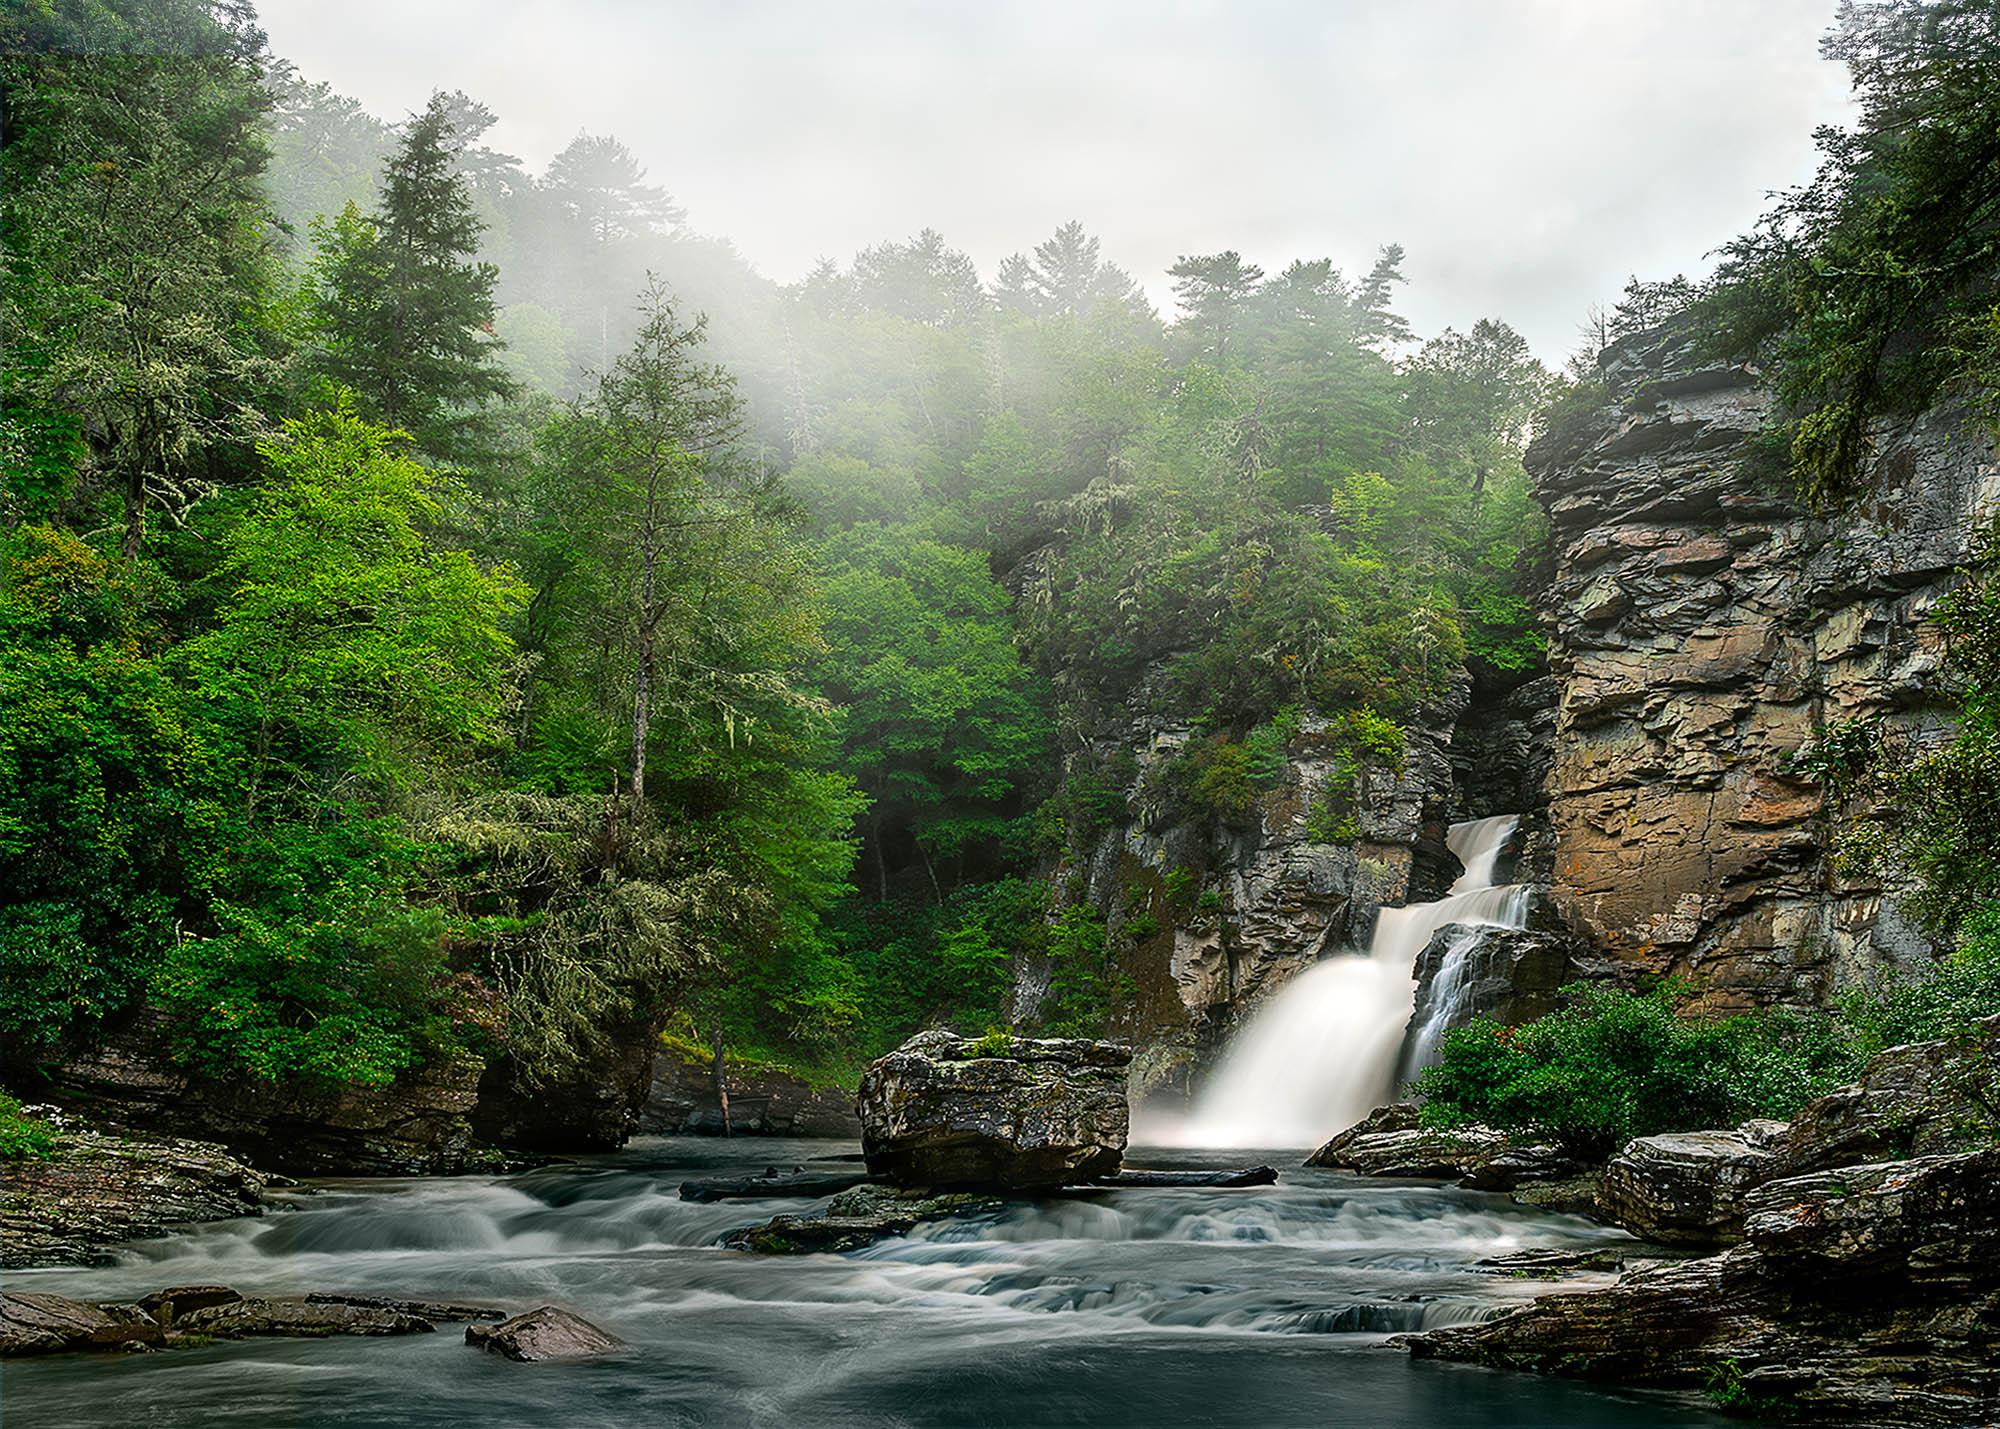 North Carolina linville falls blue ridge parkway